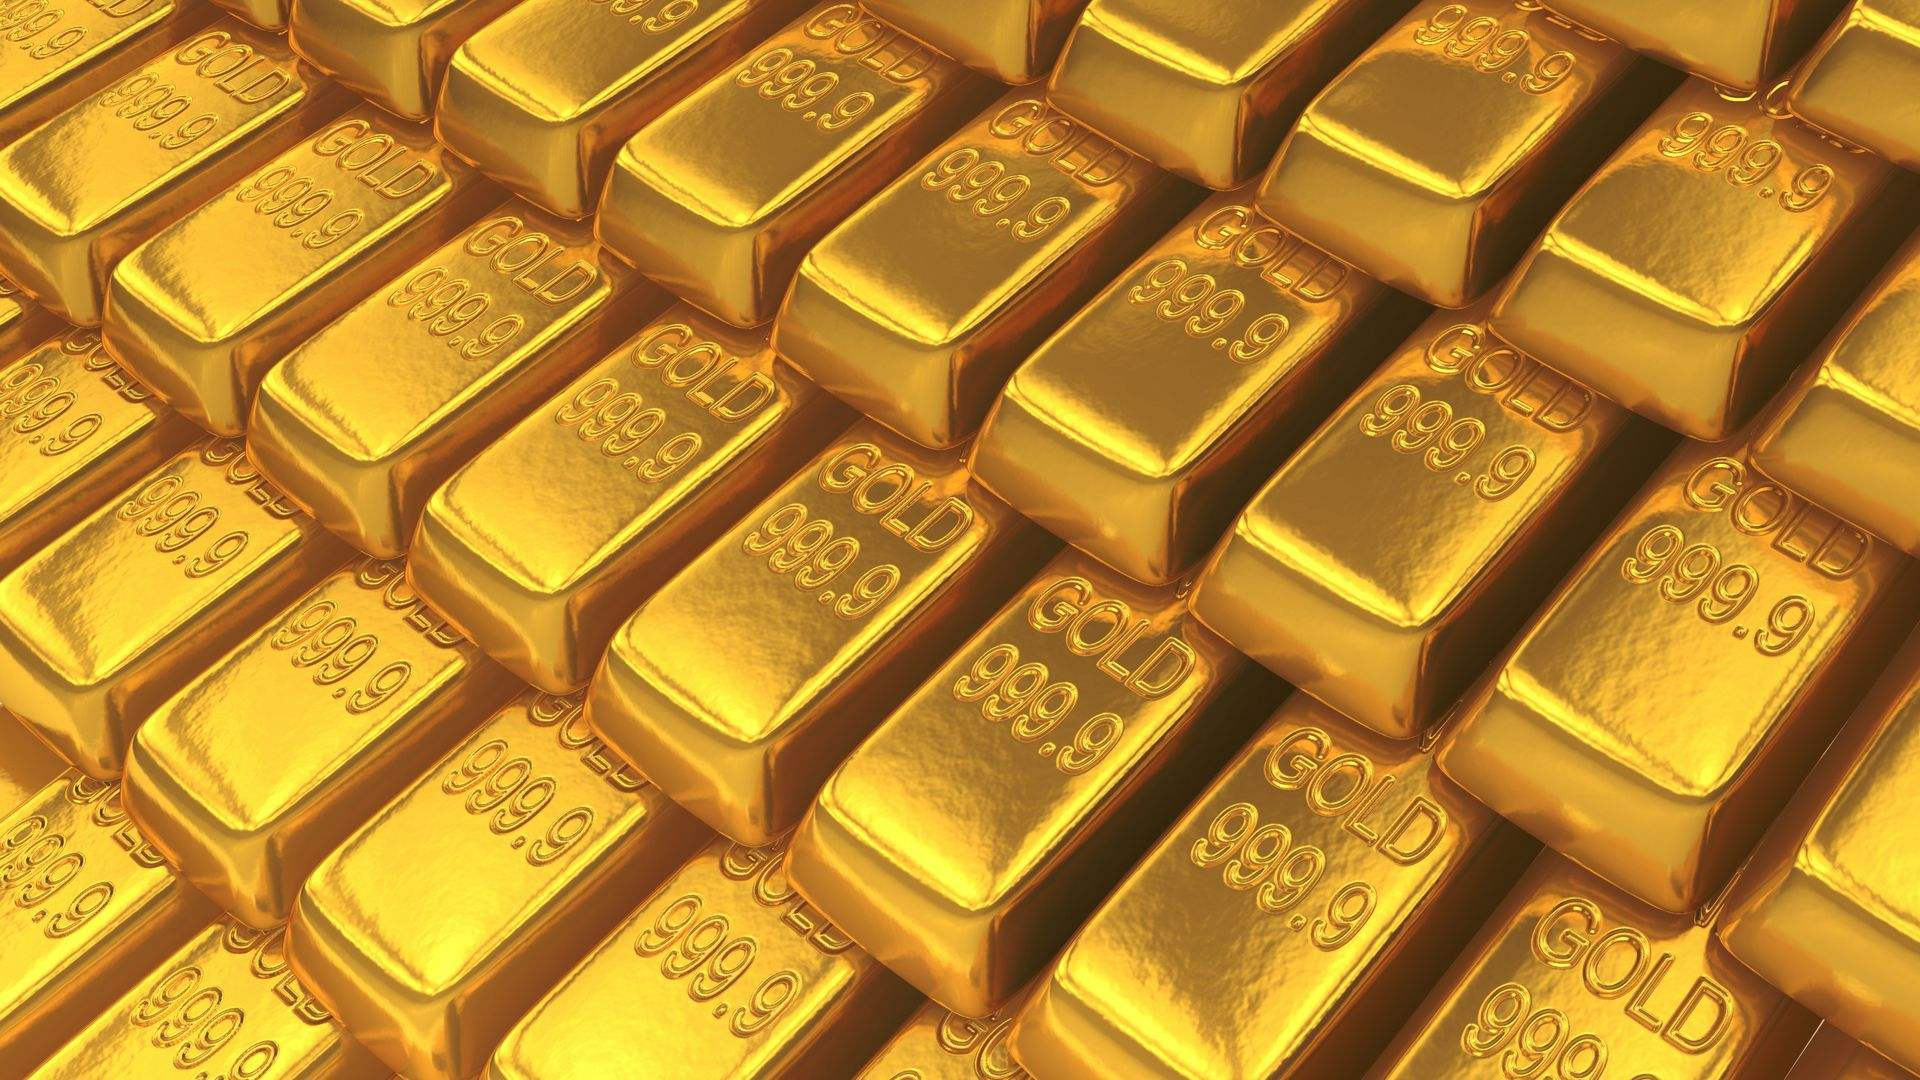 FOMC议息会议重磅登场 警惕黄金市场历史重演!